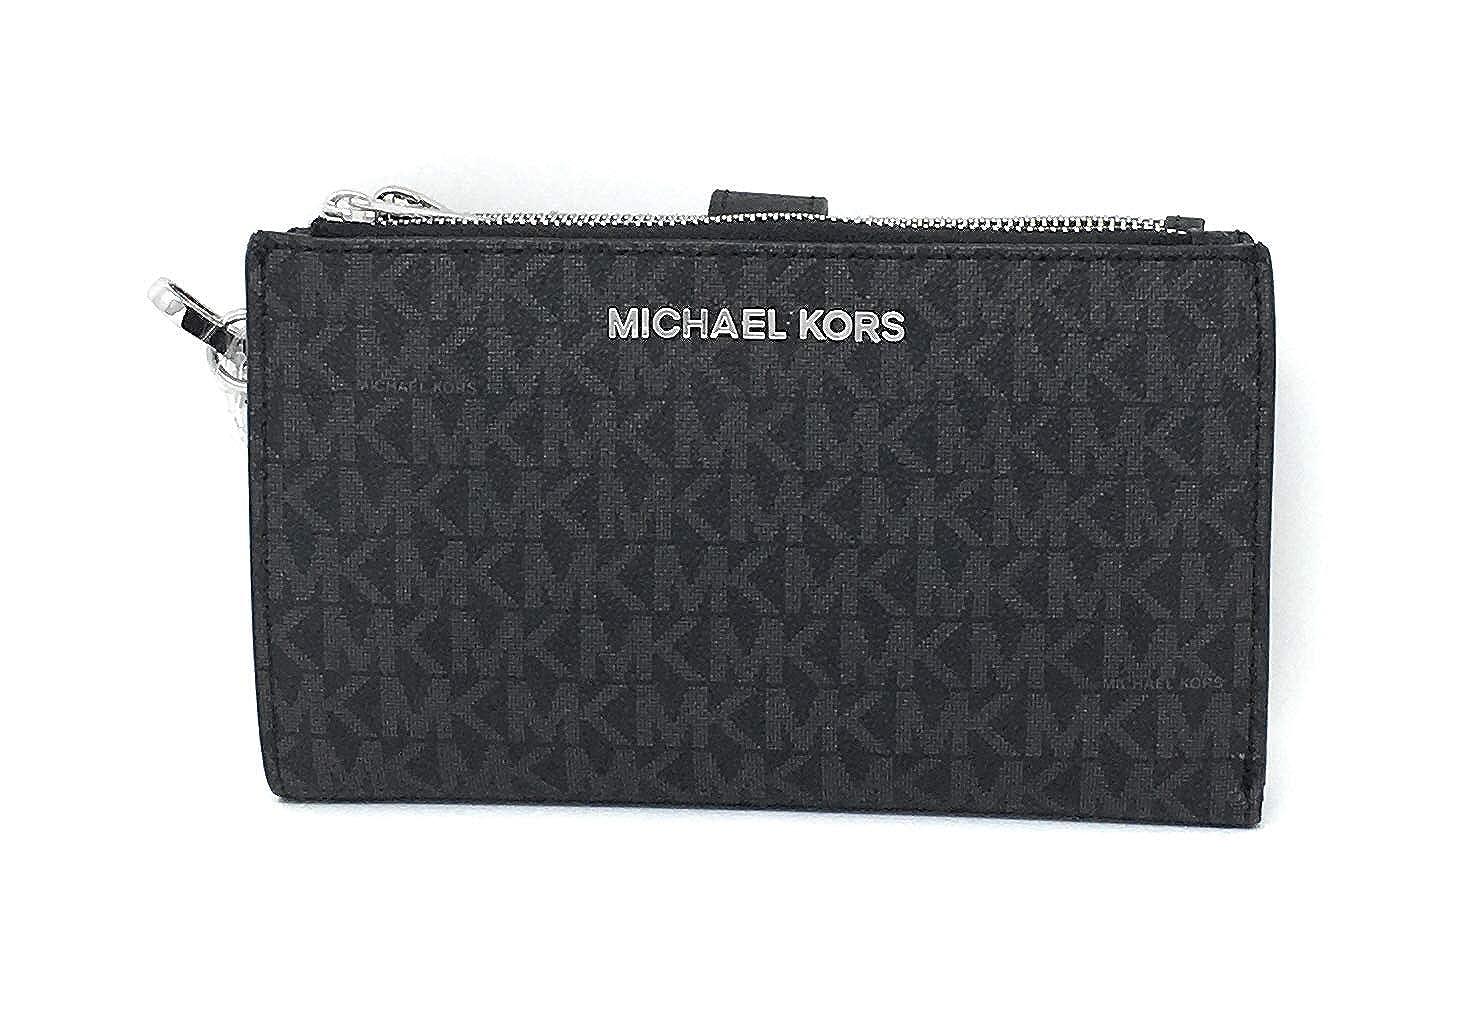 0ff19ca027da Michael Kors Jet Set Double Zip Wristlet Black PVC  Handbags  Amazon.com